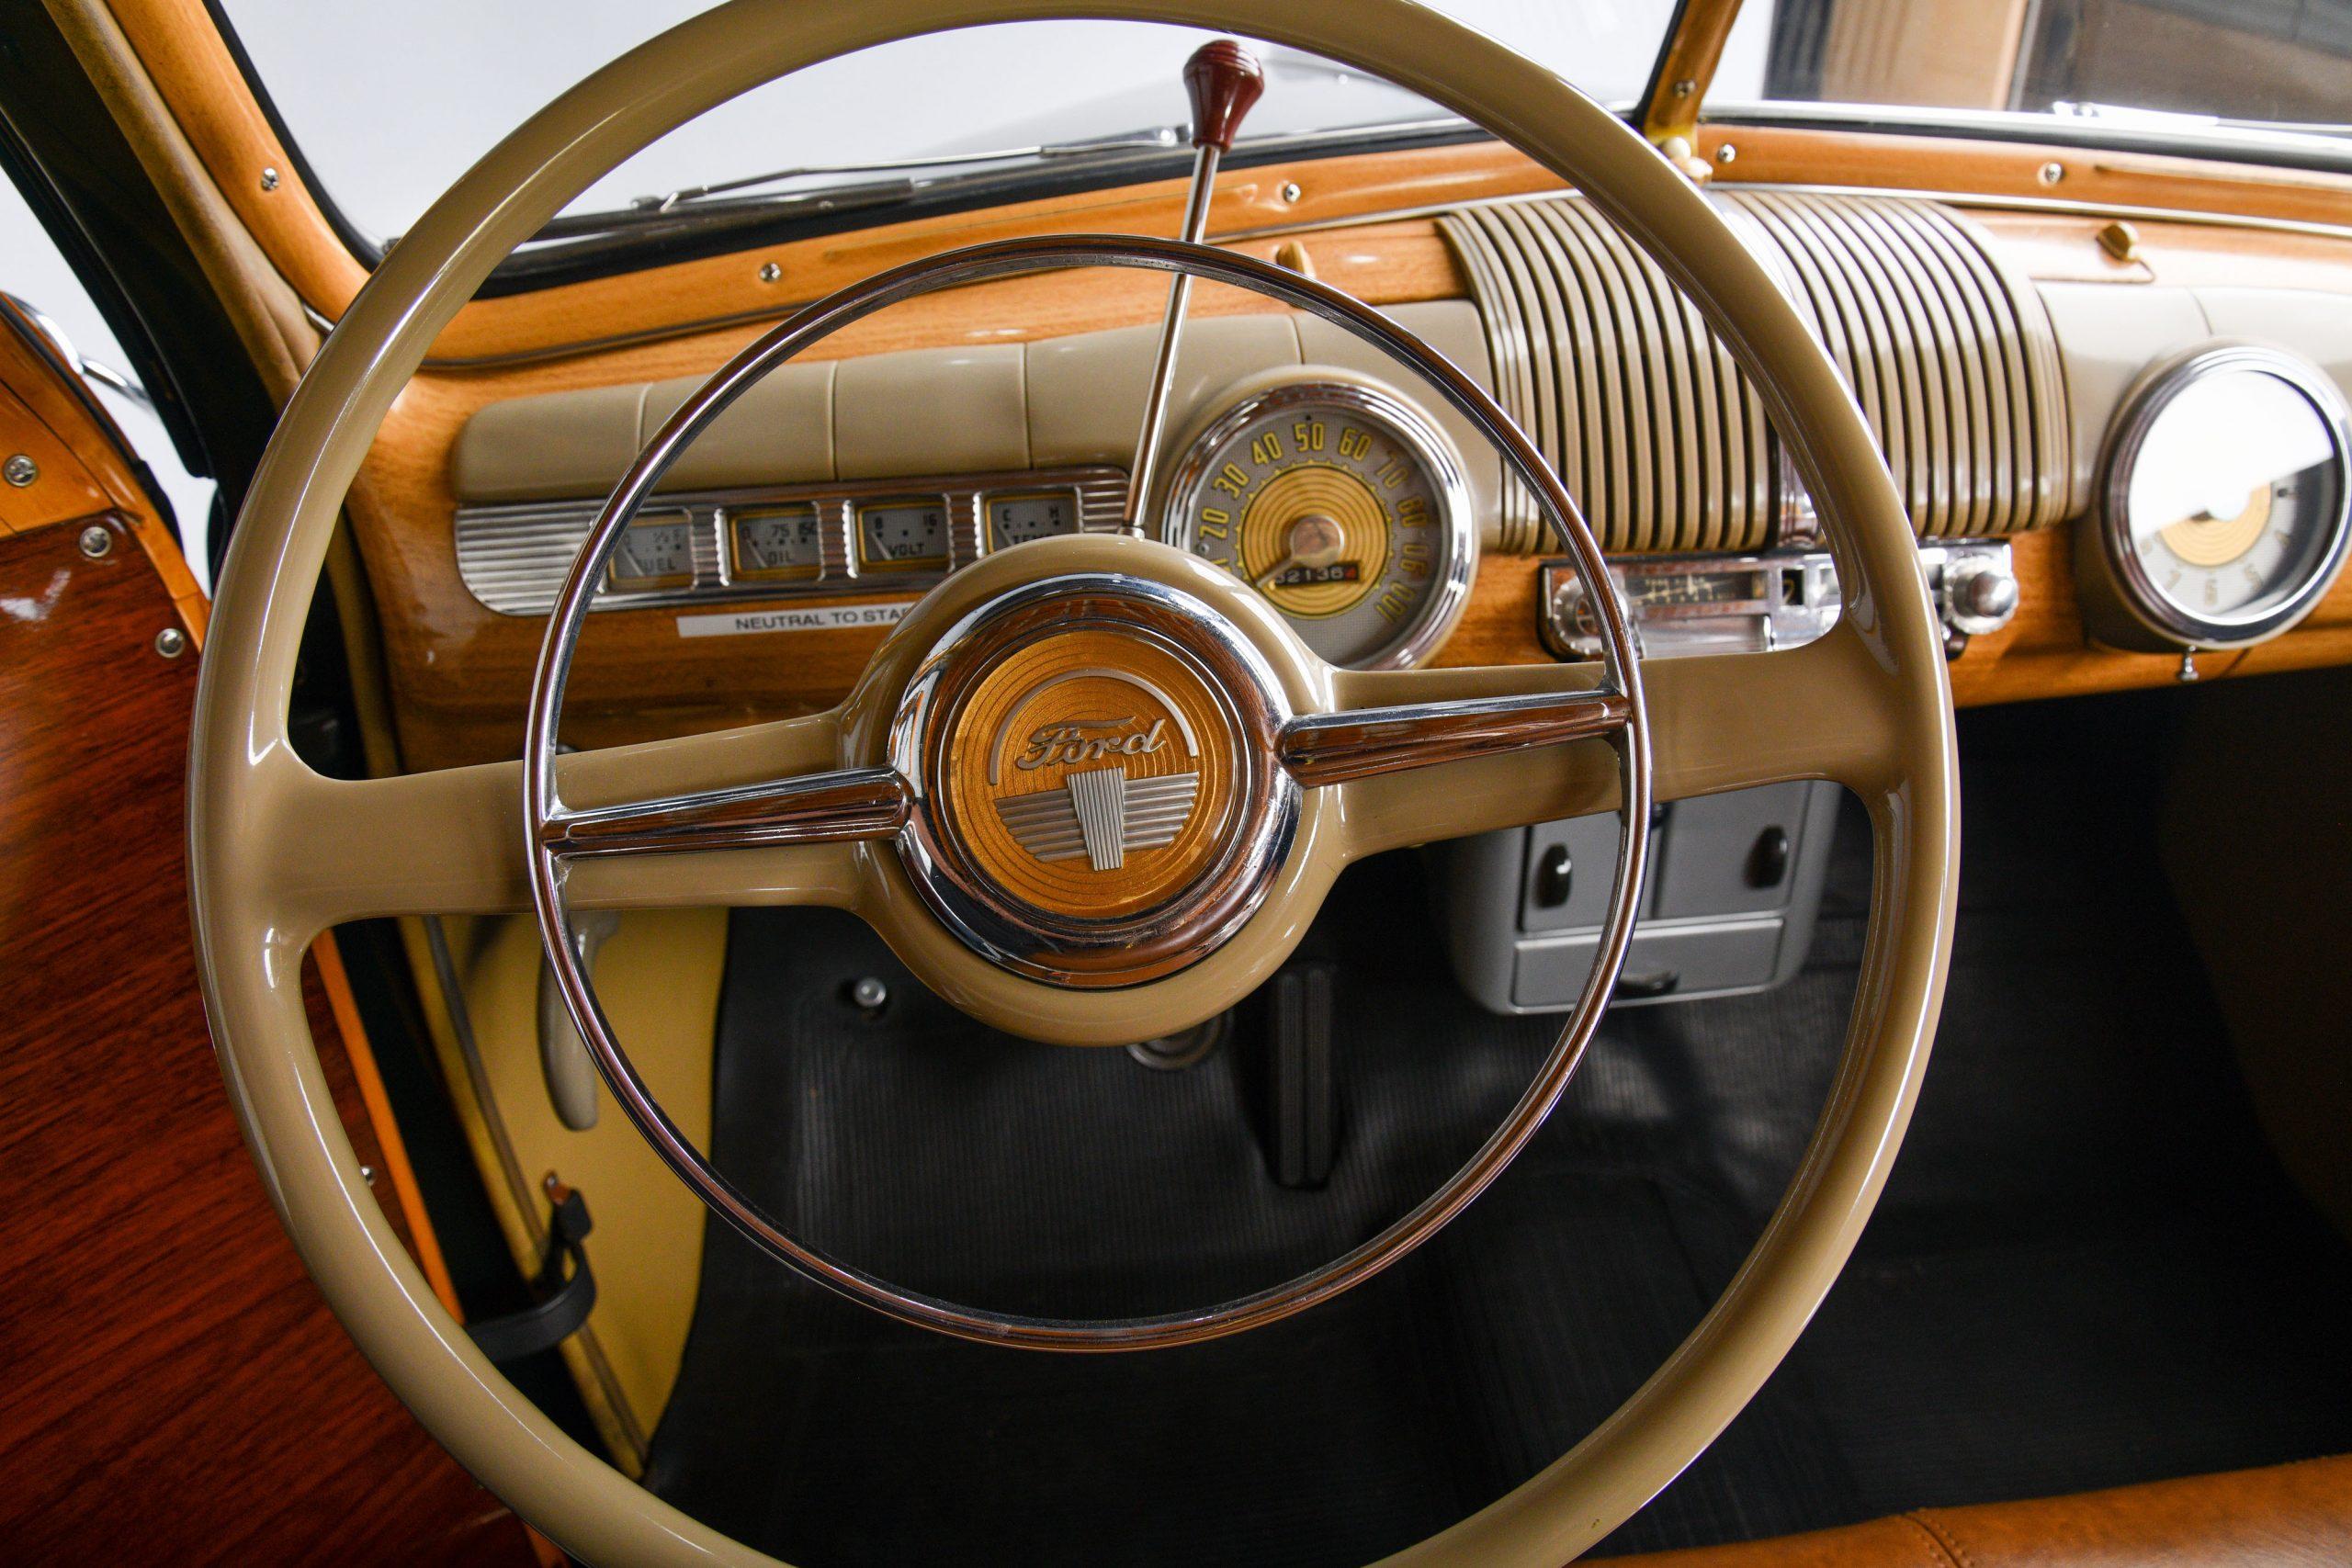 1947 FORD SUPER DELUXE CUSTOM interior steering wheel